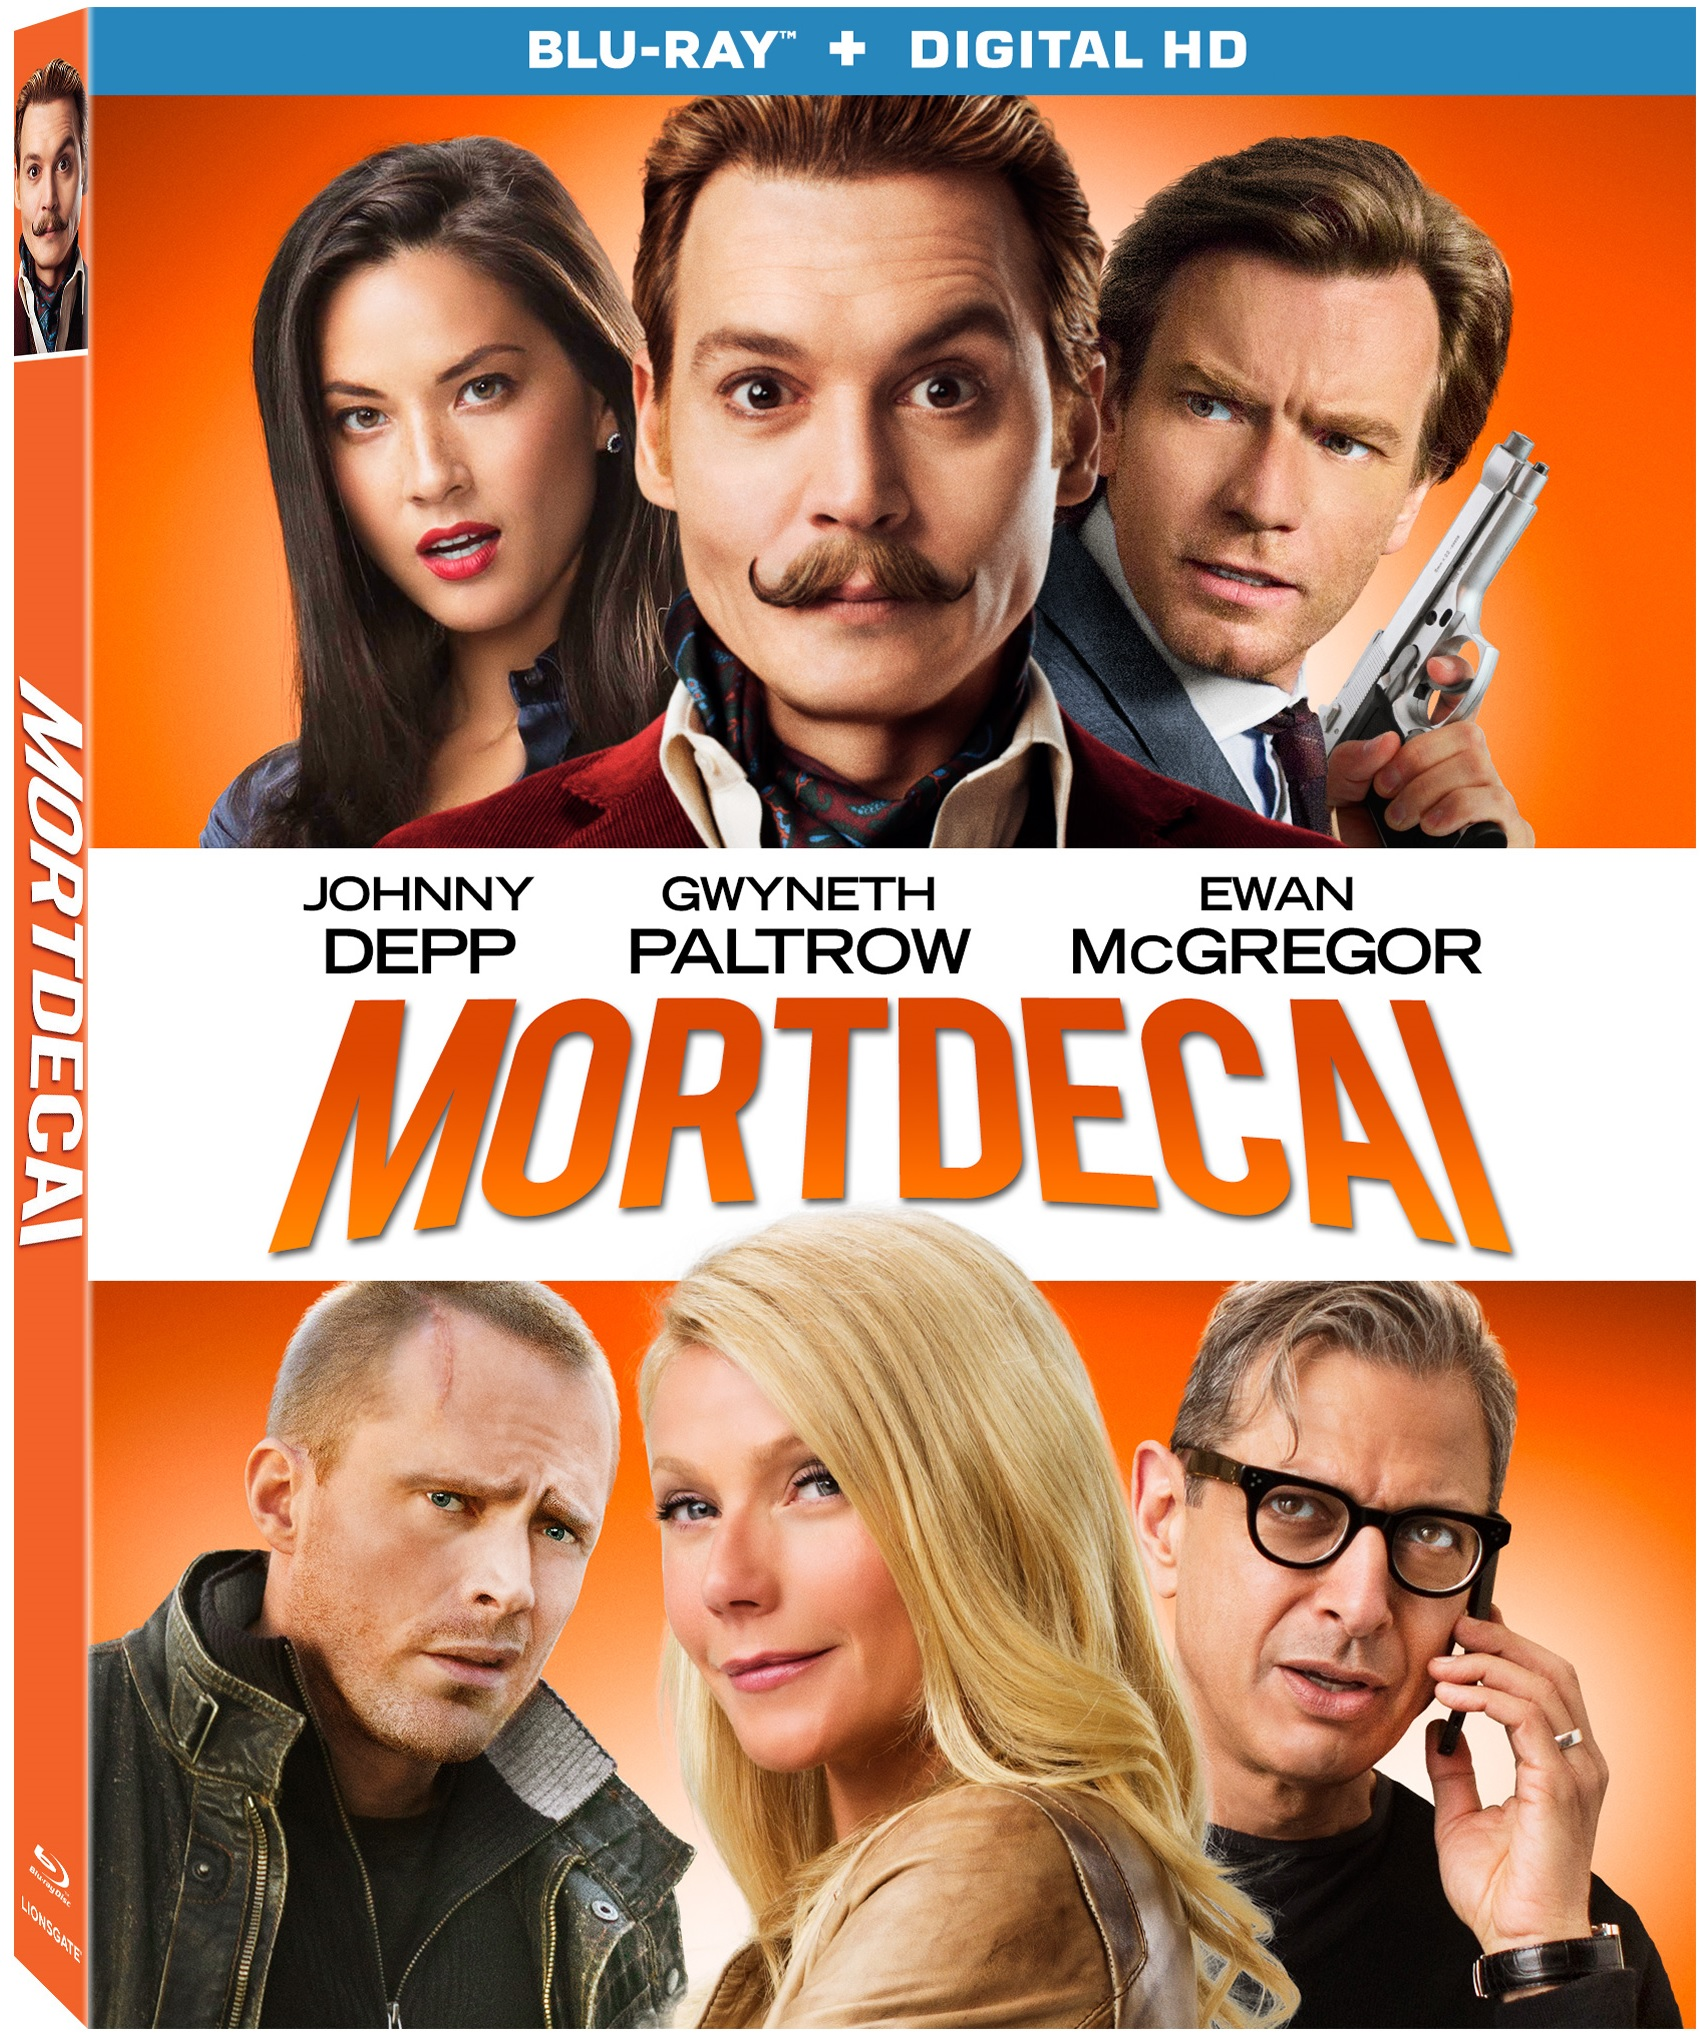 Mortdecai Blu-ray Review